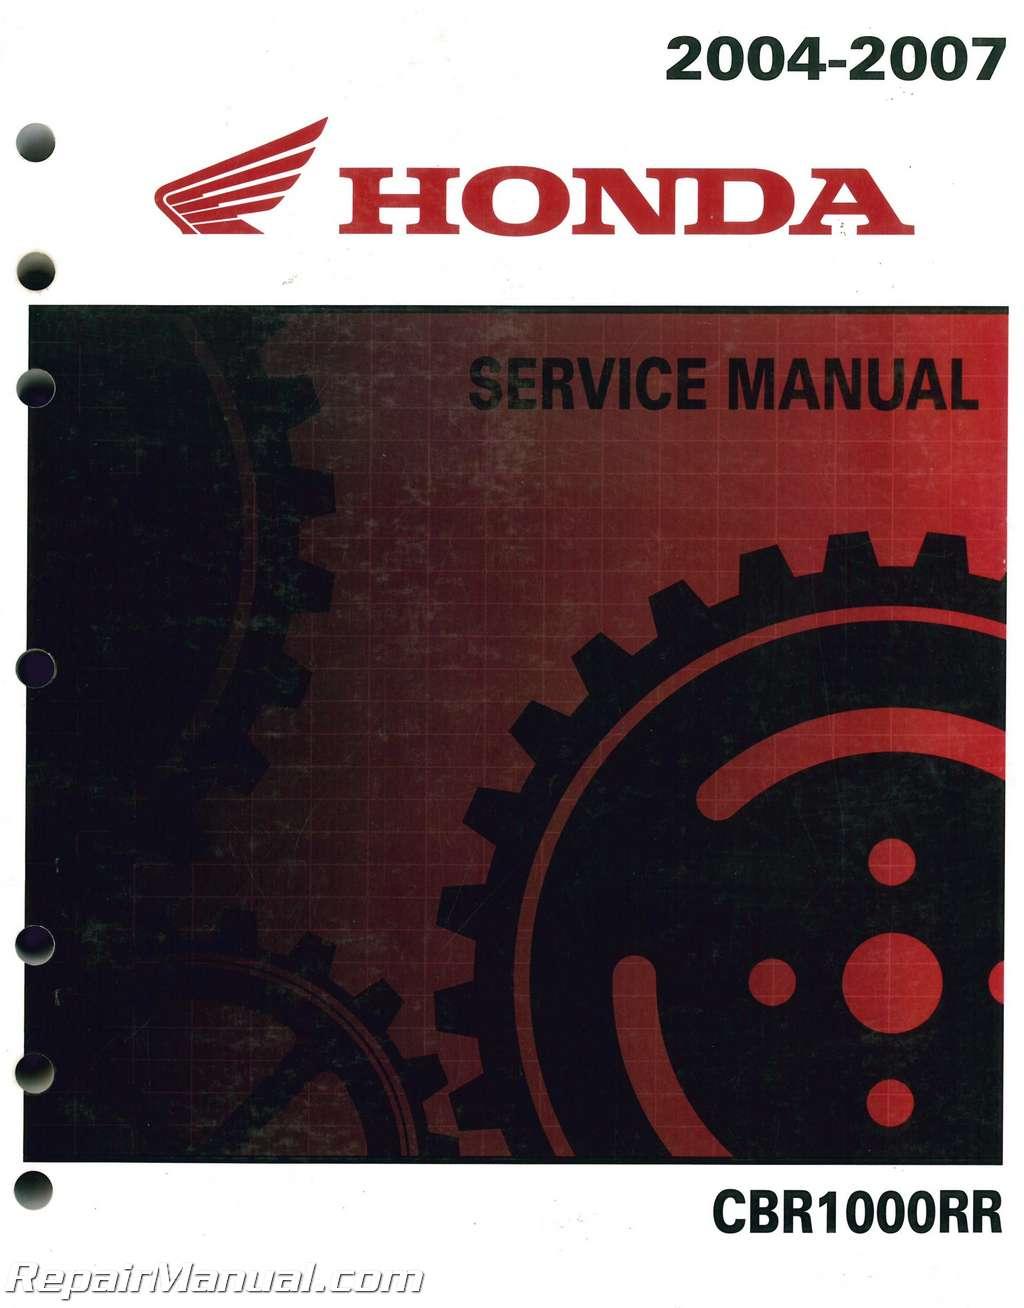 2006 honda cbr1000rr factory repair shop service manual on cd | ebay.